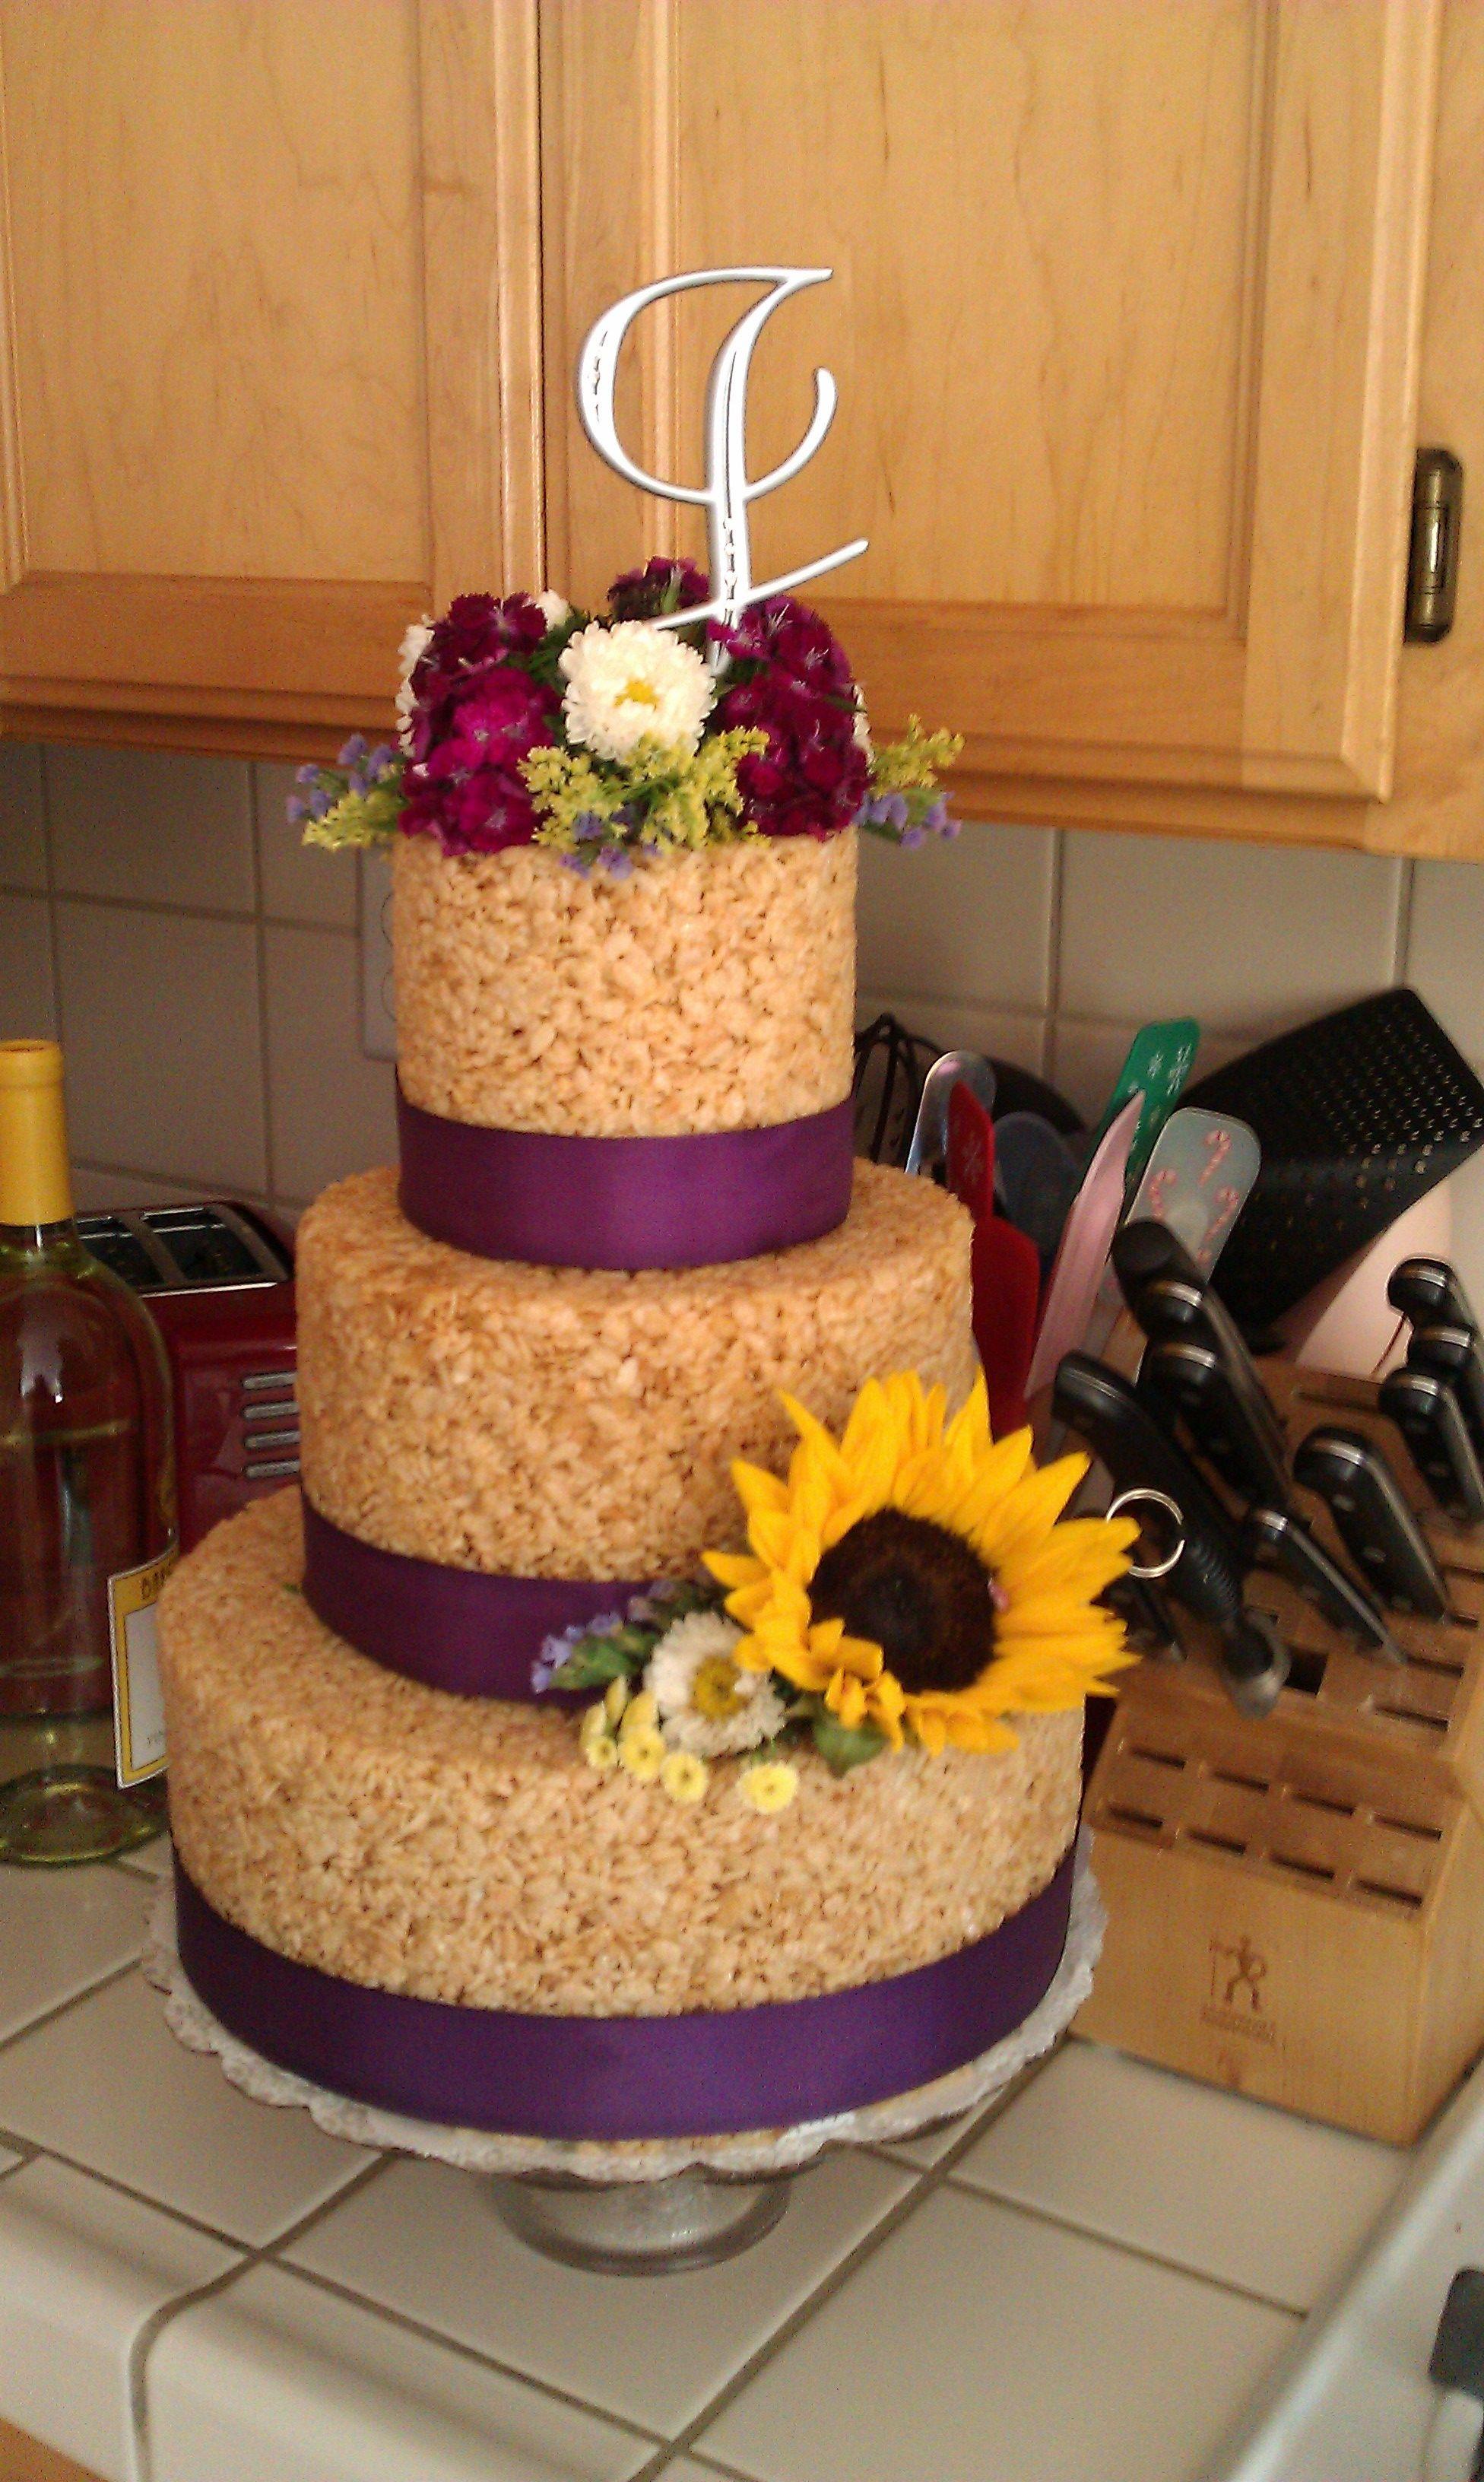 Delighted Wedding Cake Prices Tall Wedding Cakes With Cupcakes Round Wedding Cake Frosting Wood Wedding Cake Old A Wedding Cake GreenSafeway Wedding Cakes 25 Cheap And Cool Wedding Cake Alternatives | Weddingomania | Cake ..